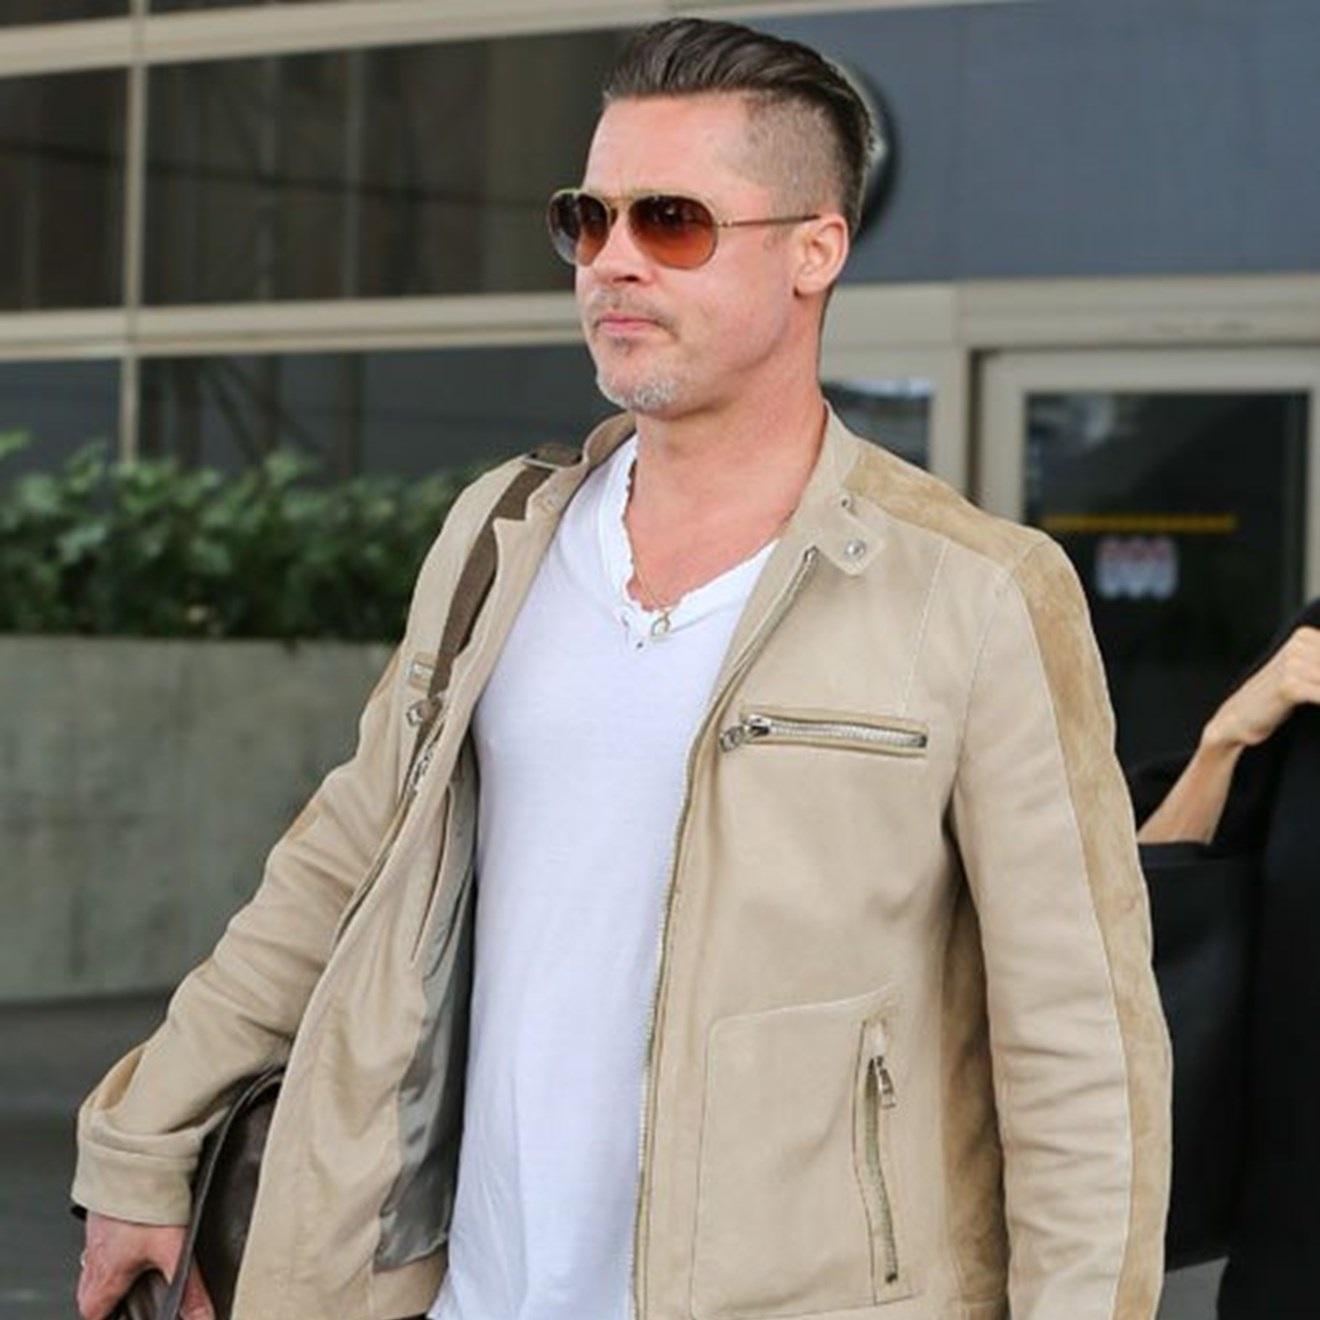 10. Brad Pitt -